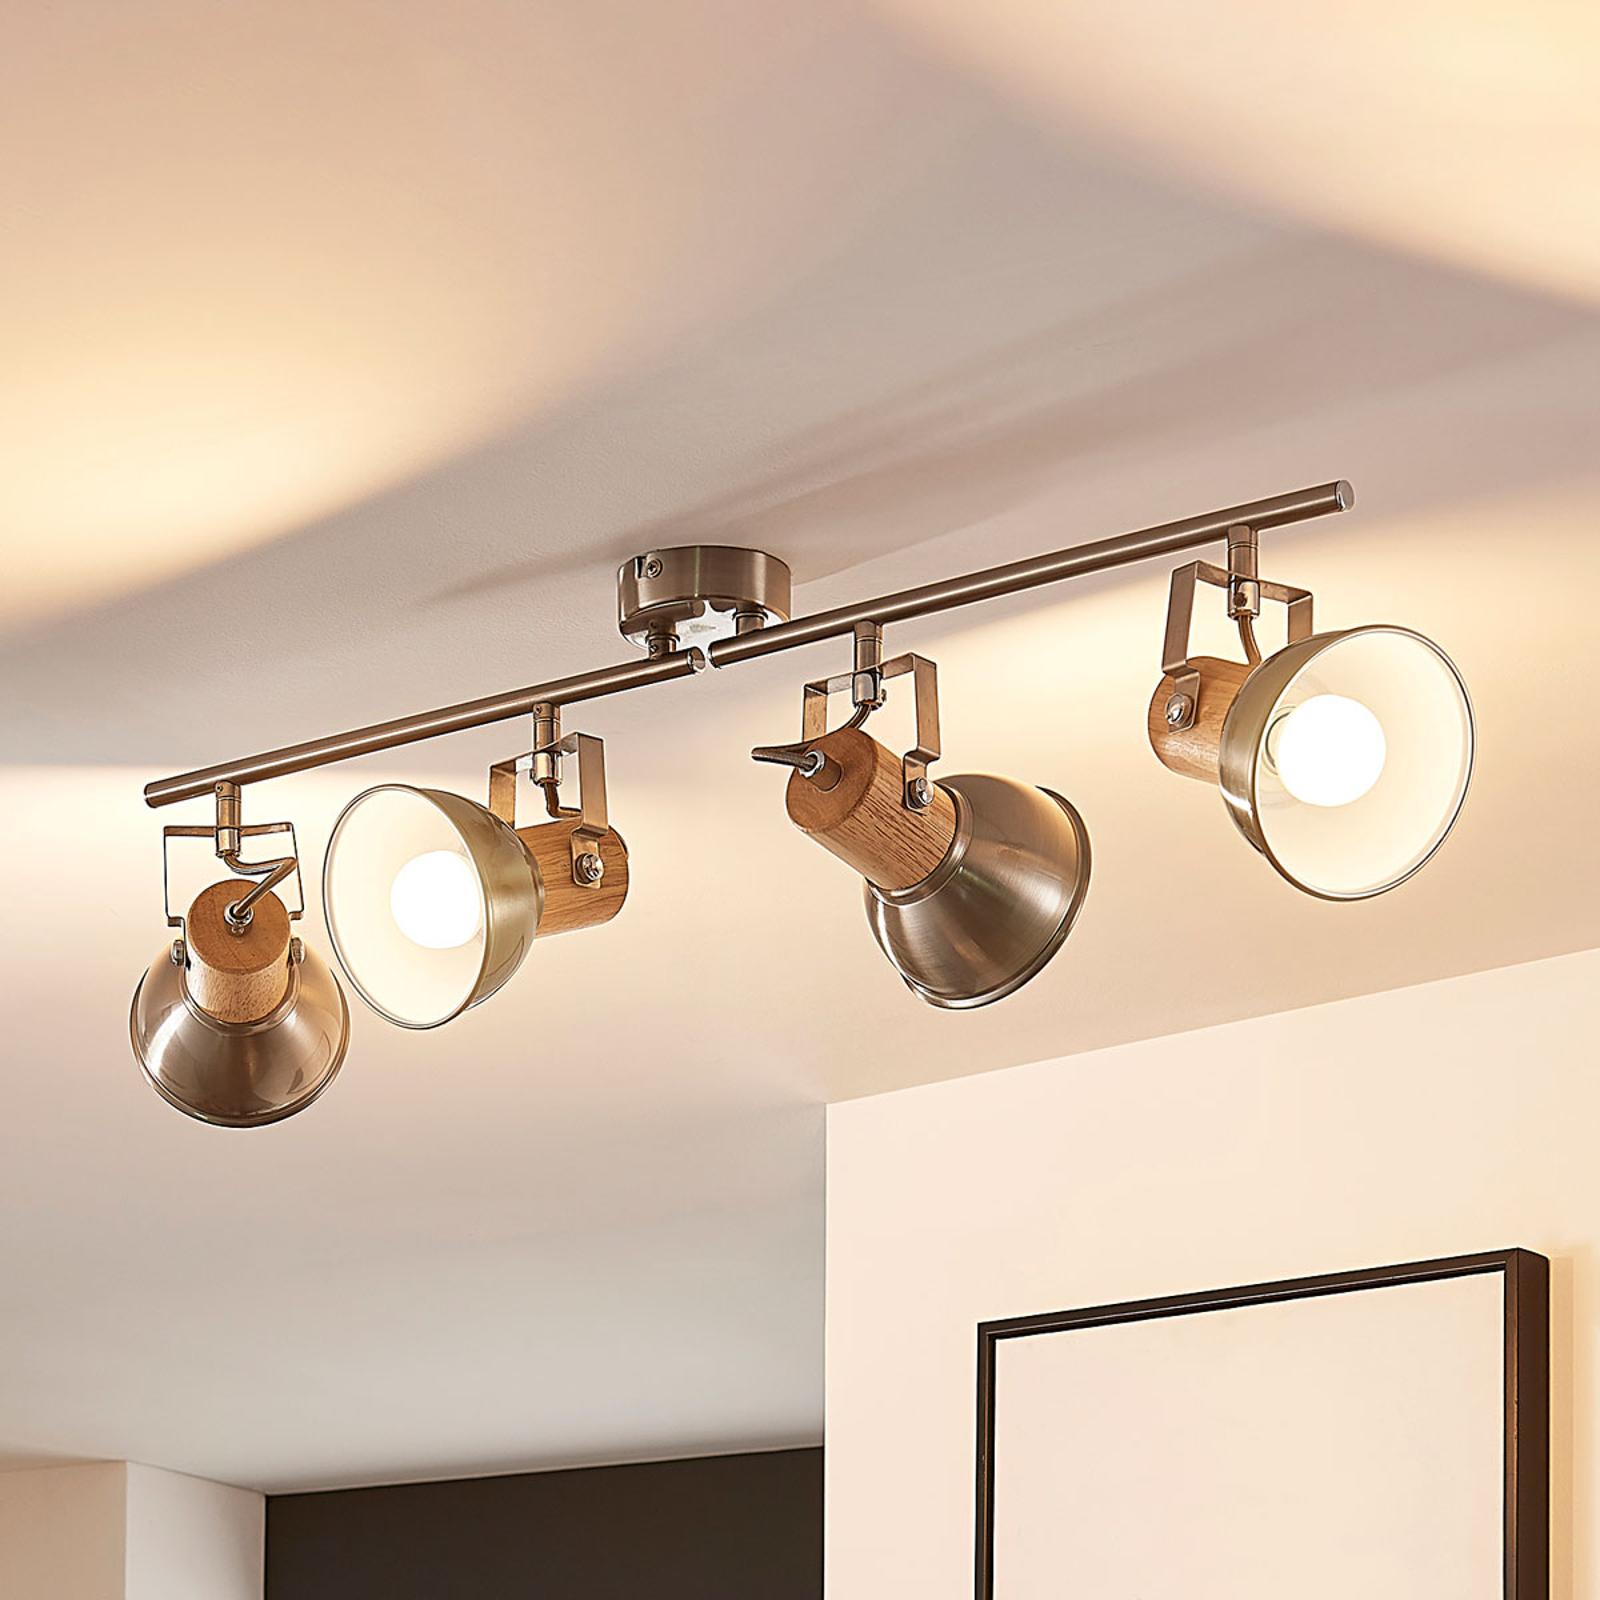 LED-taklampe Dennis med 4 lyskilder, med tre